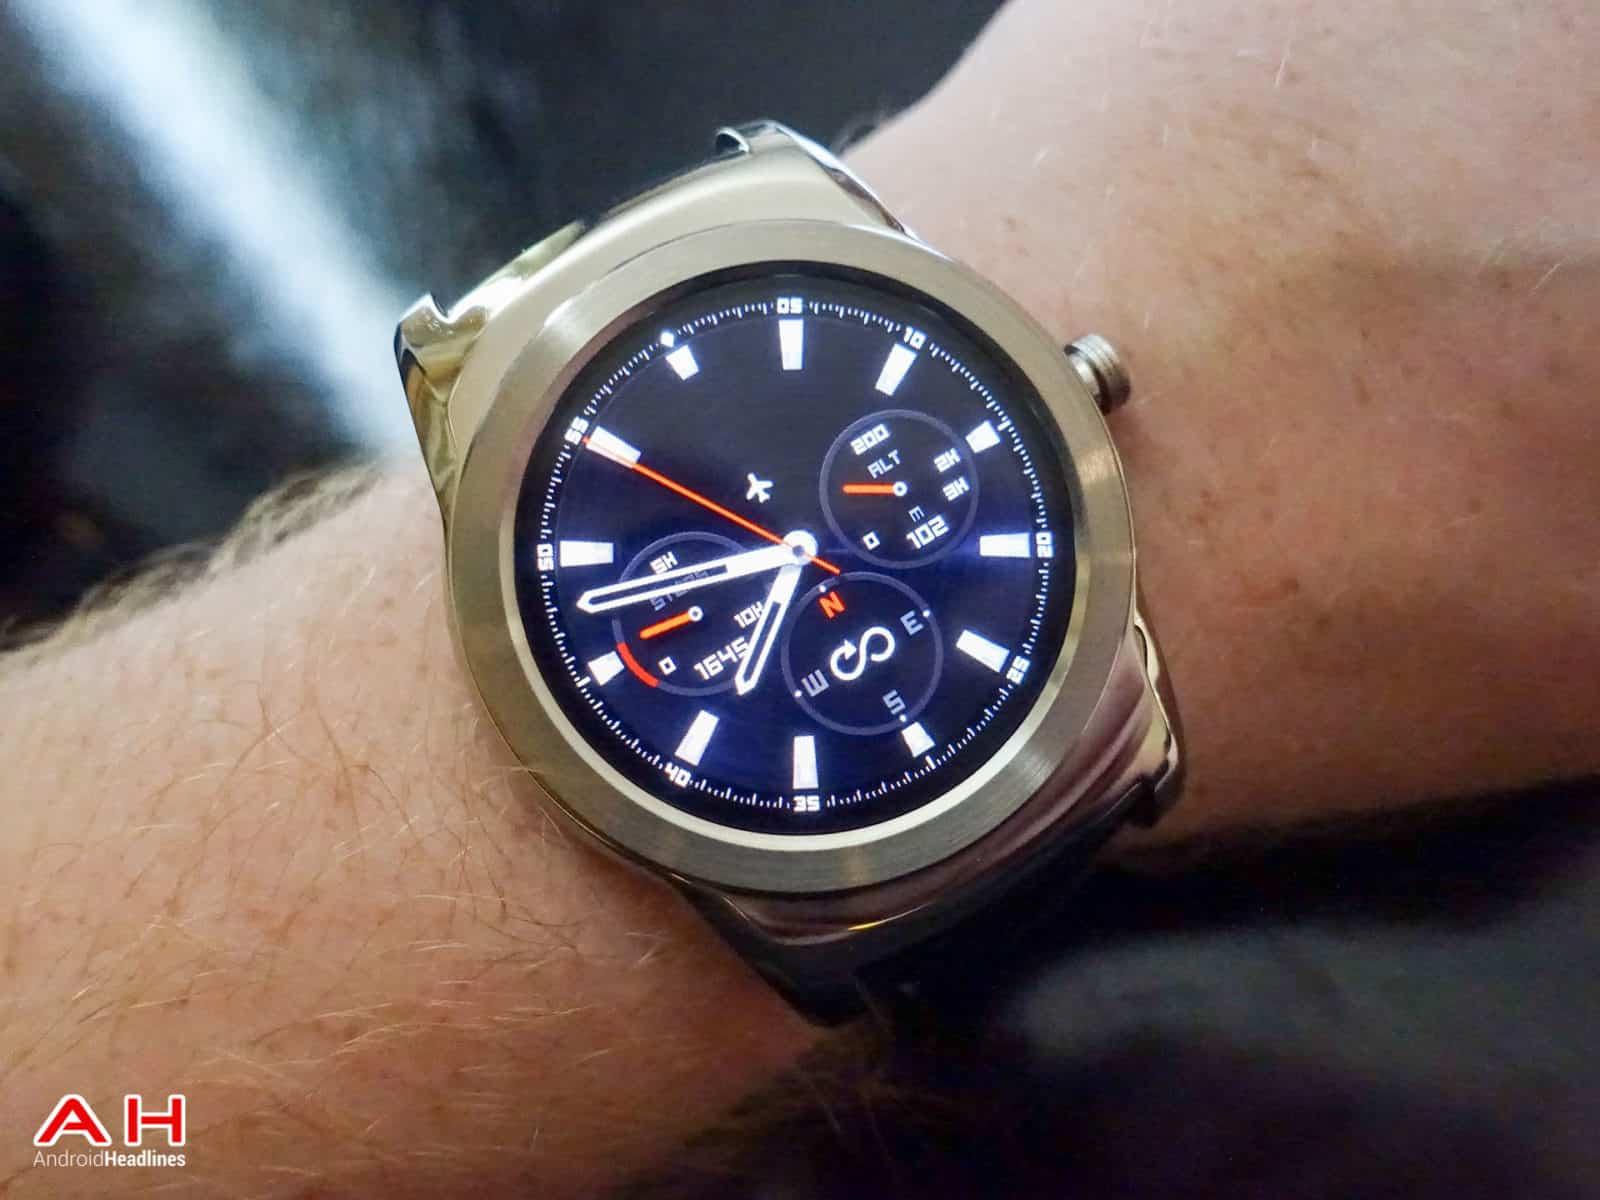 LG-Watch-Urbane-Review-AH-21